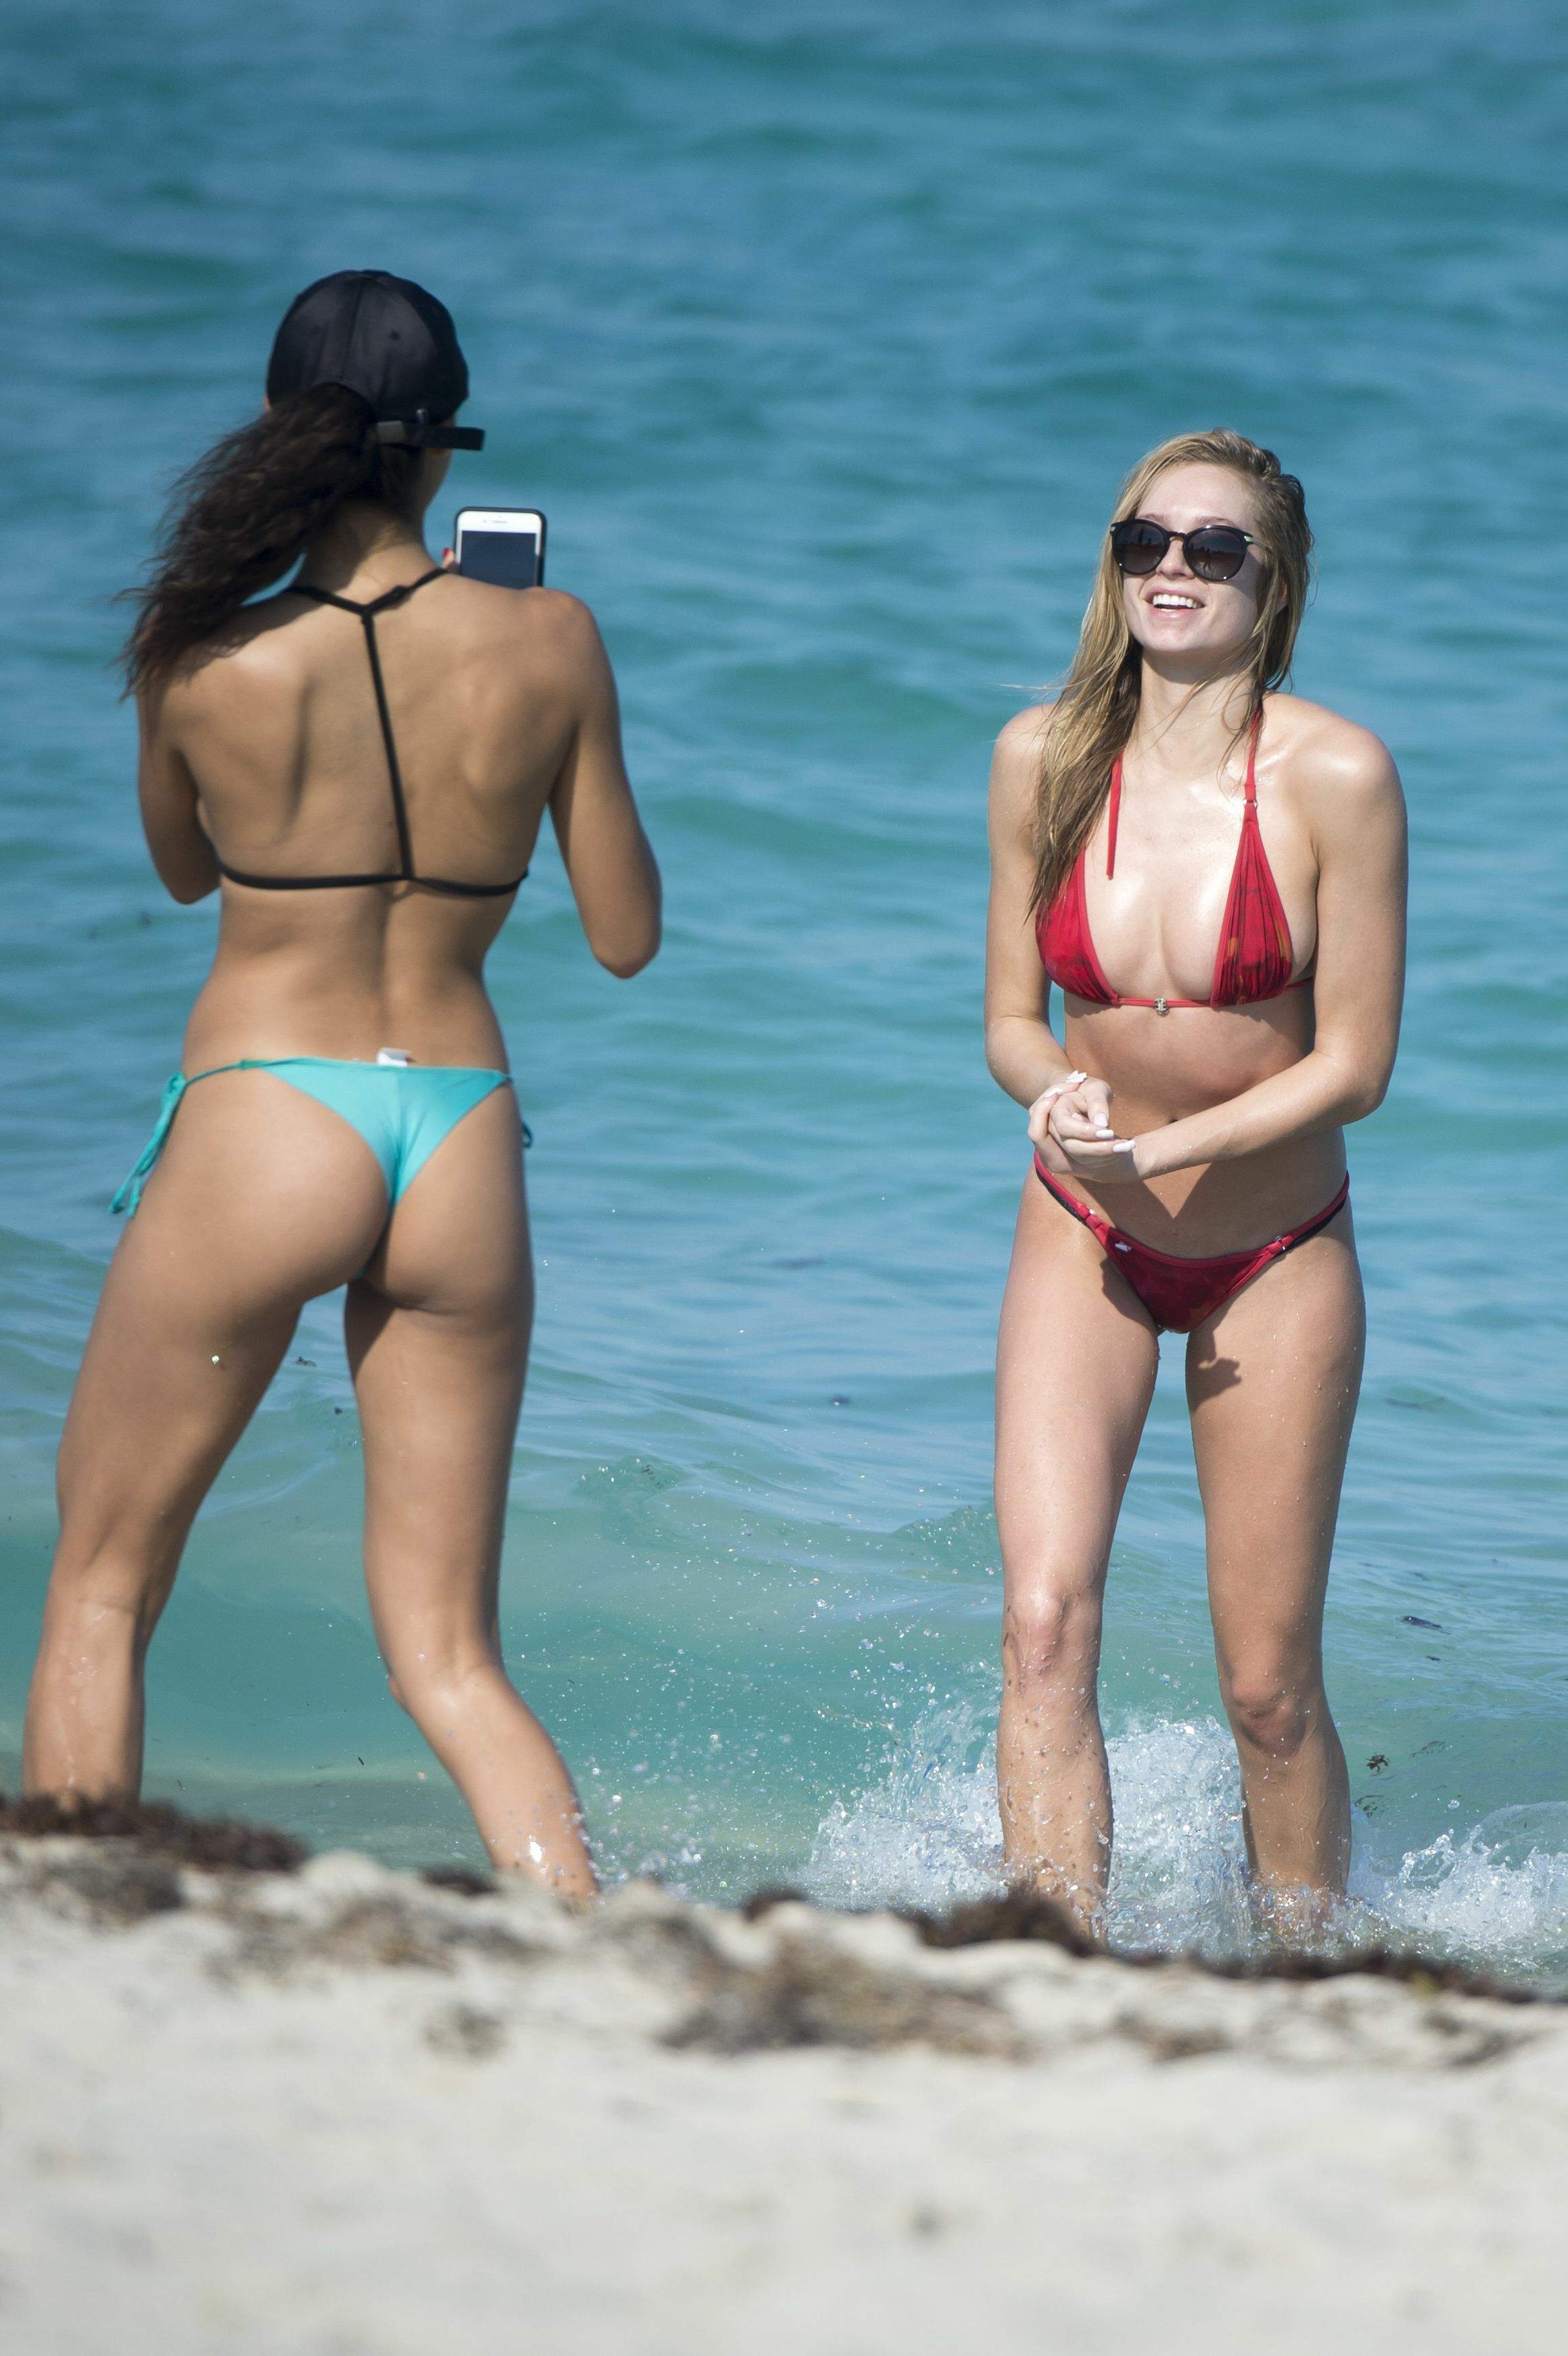 XXX Michelle Pooch nude photos 2019